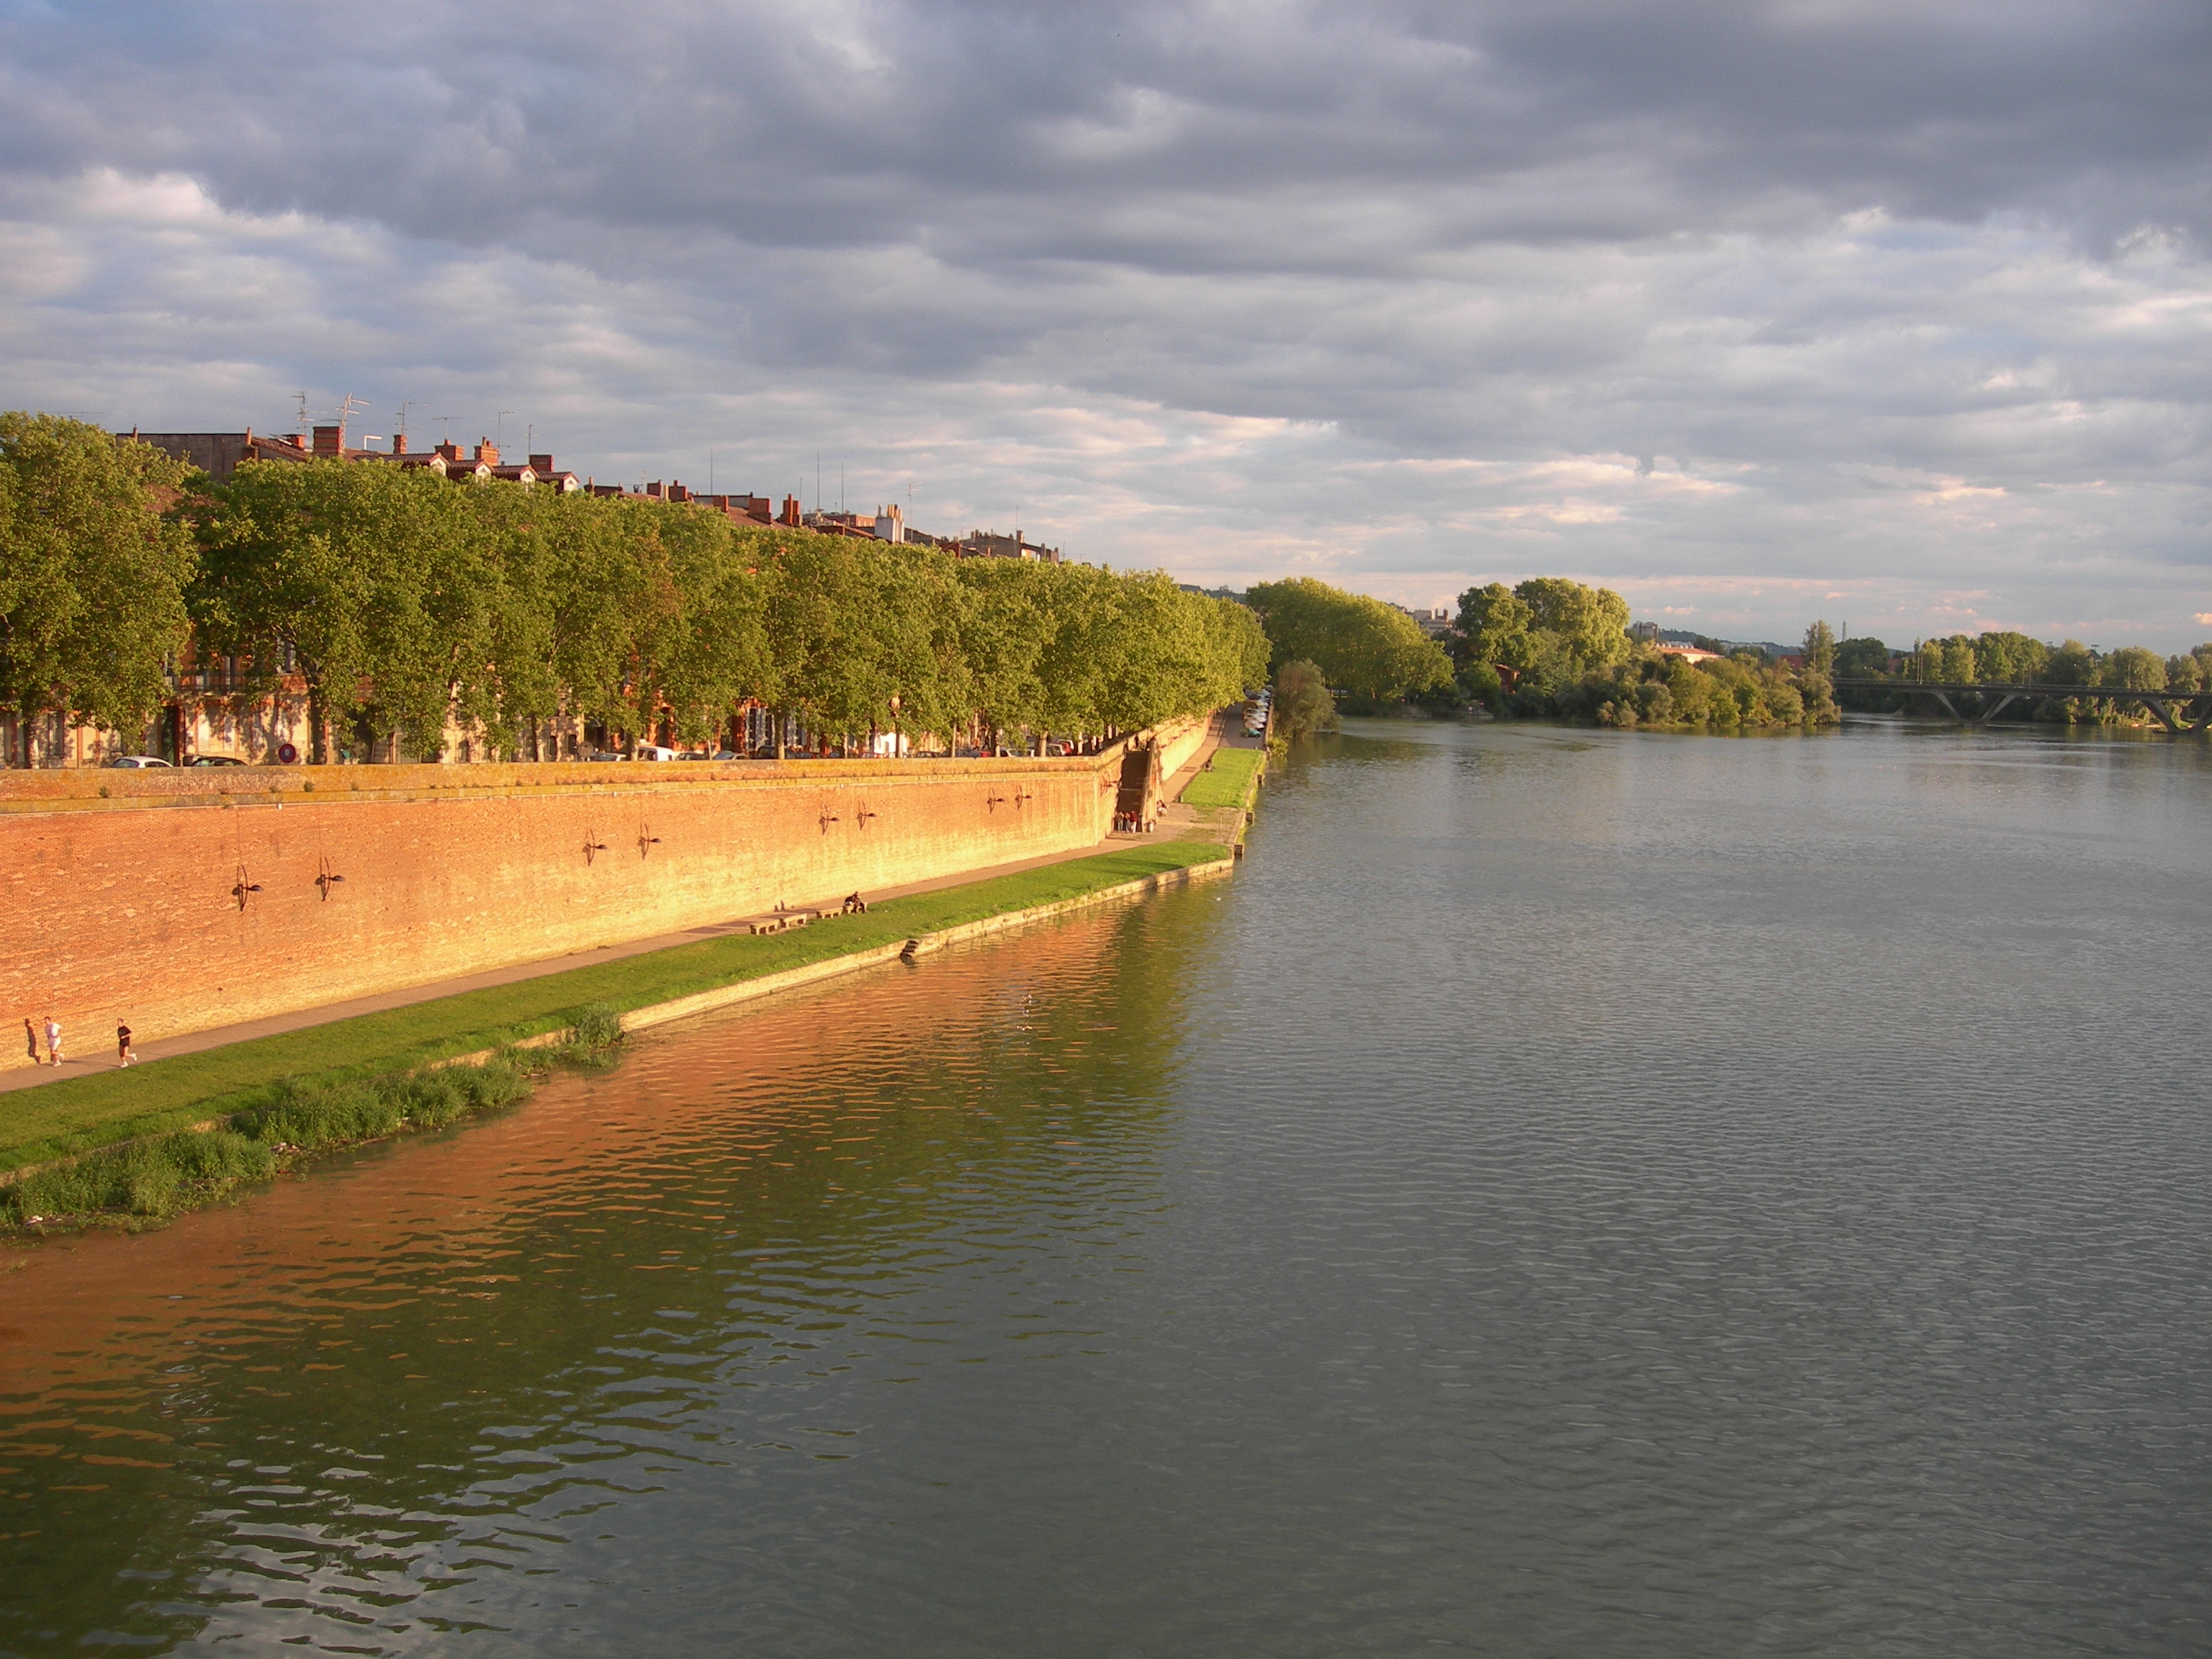 FileToulouse quai de tounis vu du pont neufjpg